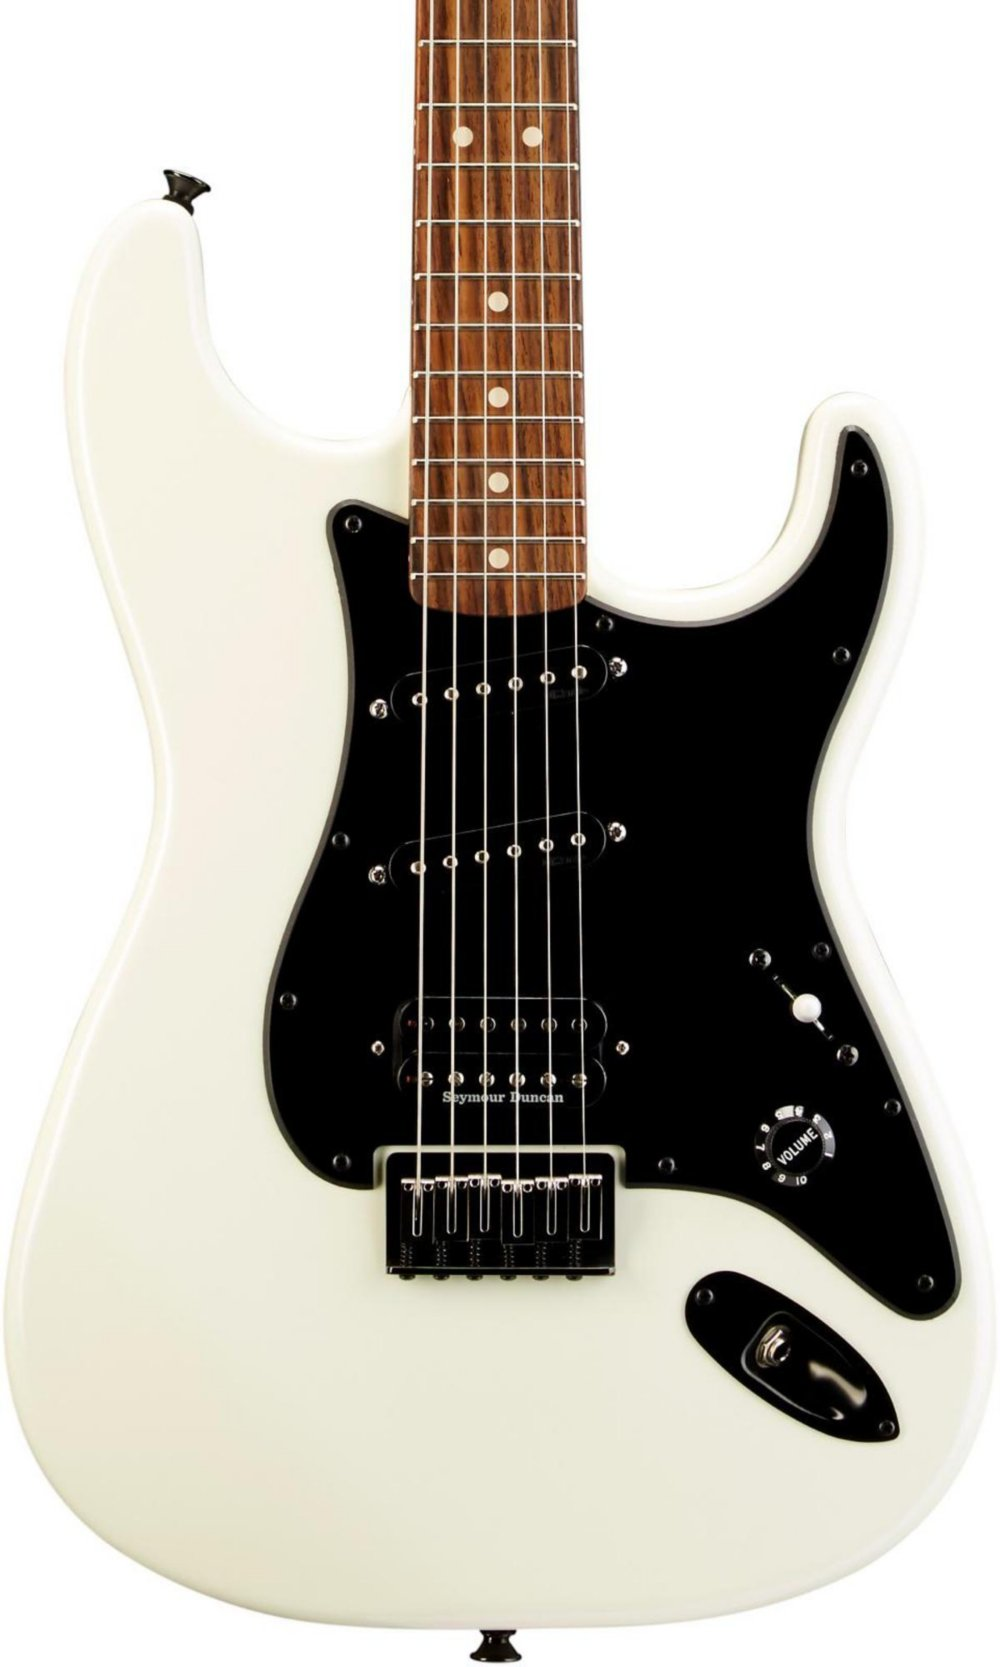 charvel jake e lee signature model electric guitar pearl white guitar affinity. Black Bedroom Furniture Sets. Home Design Ideas